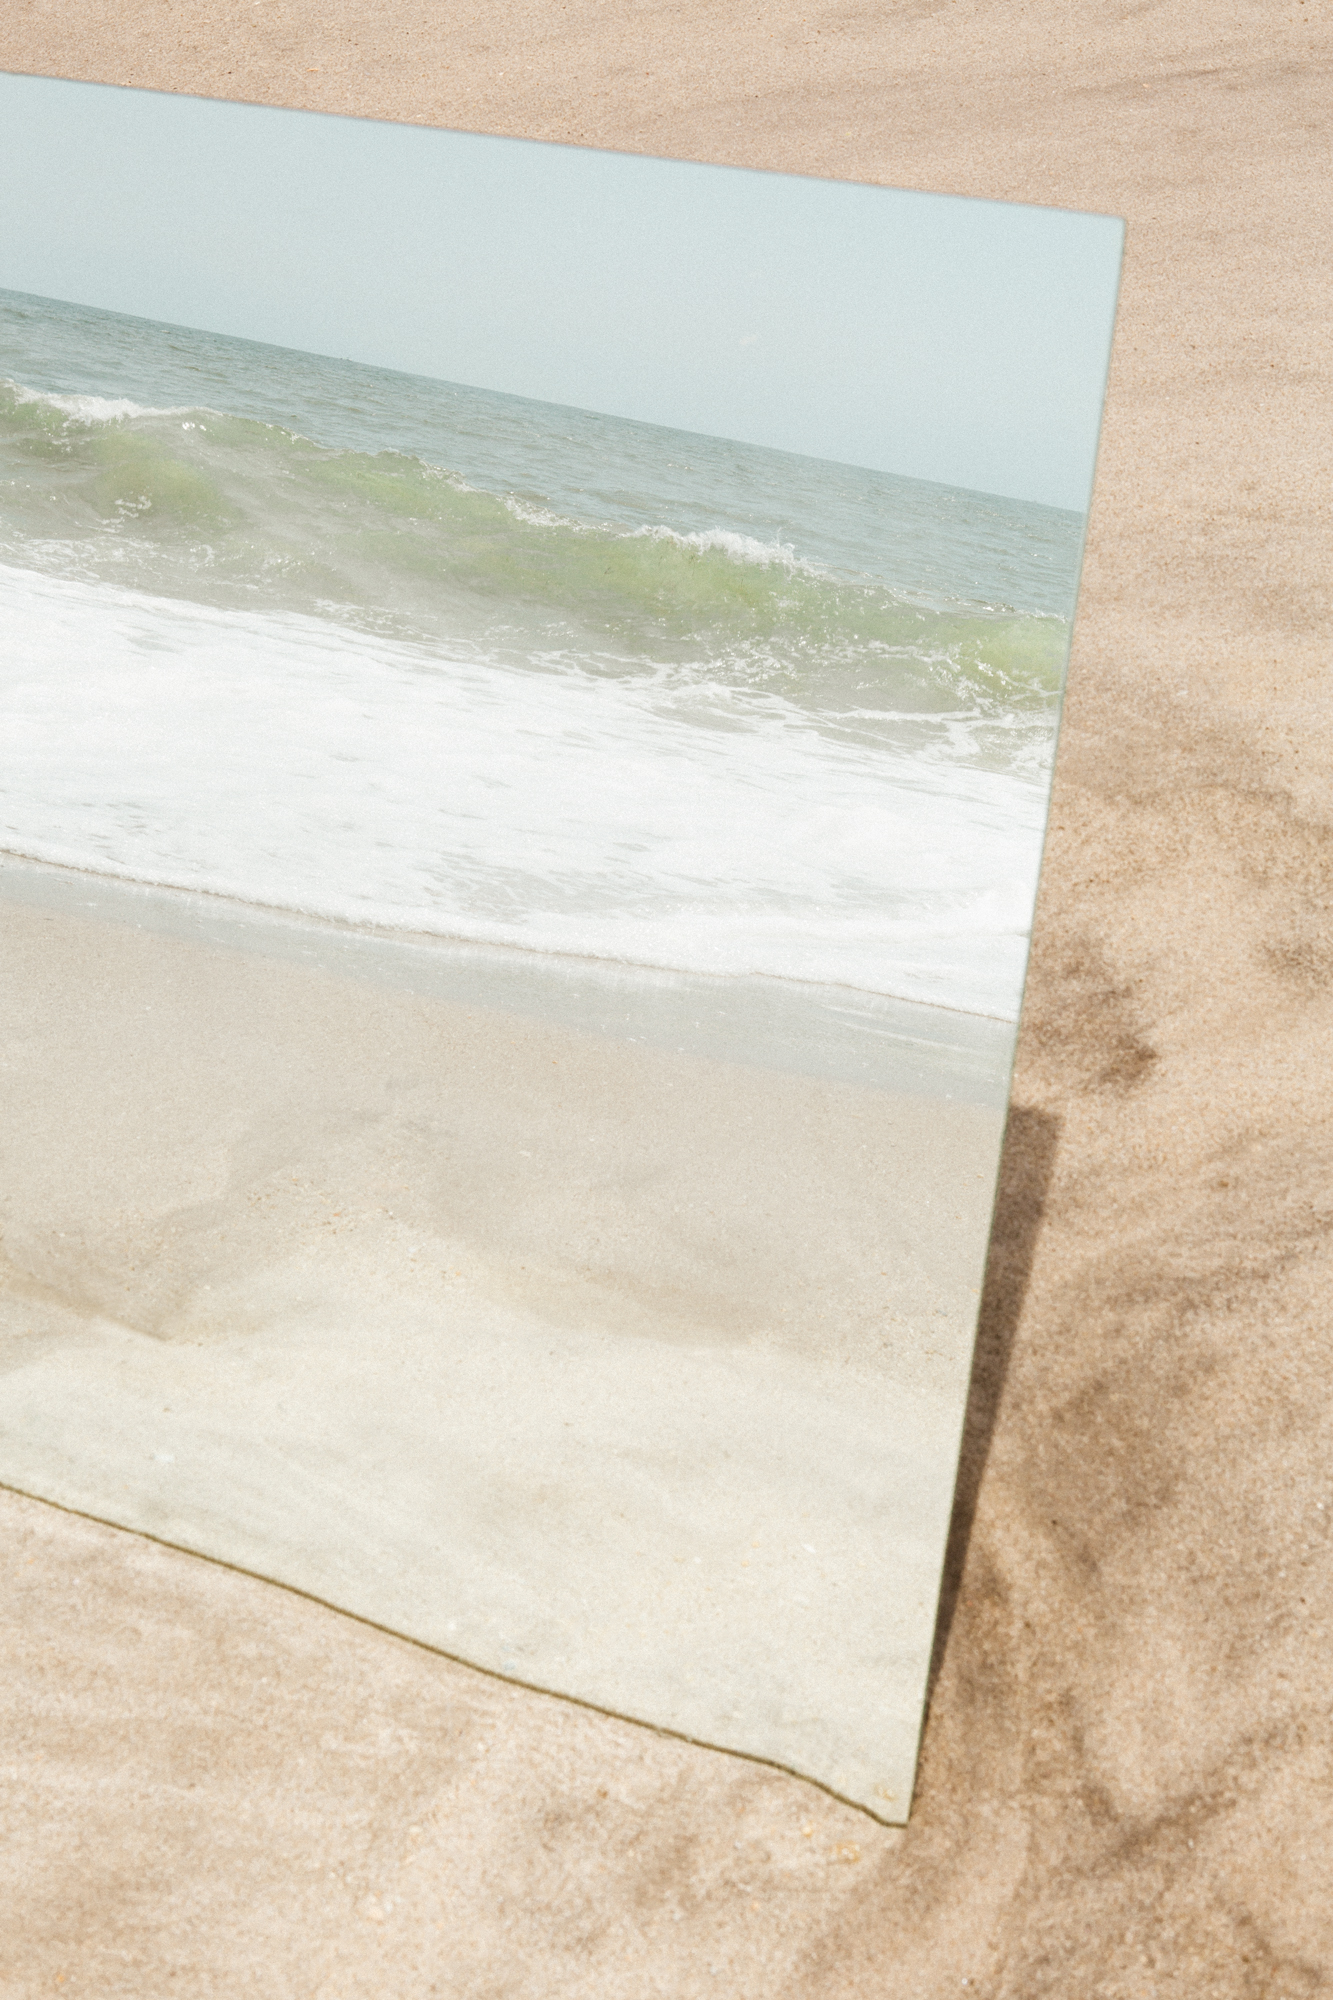 isles_mirror